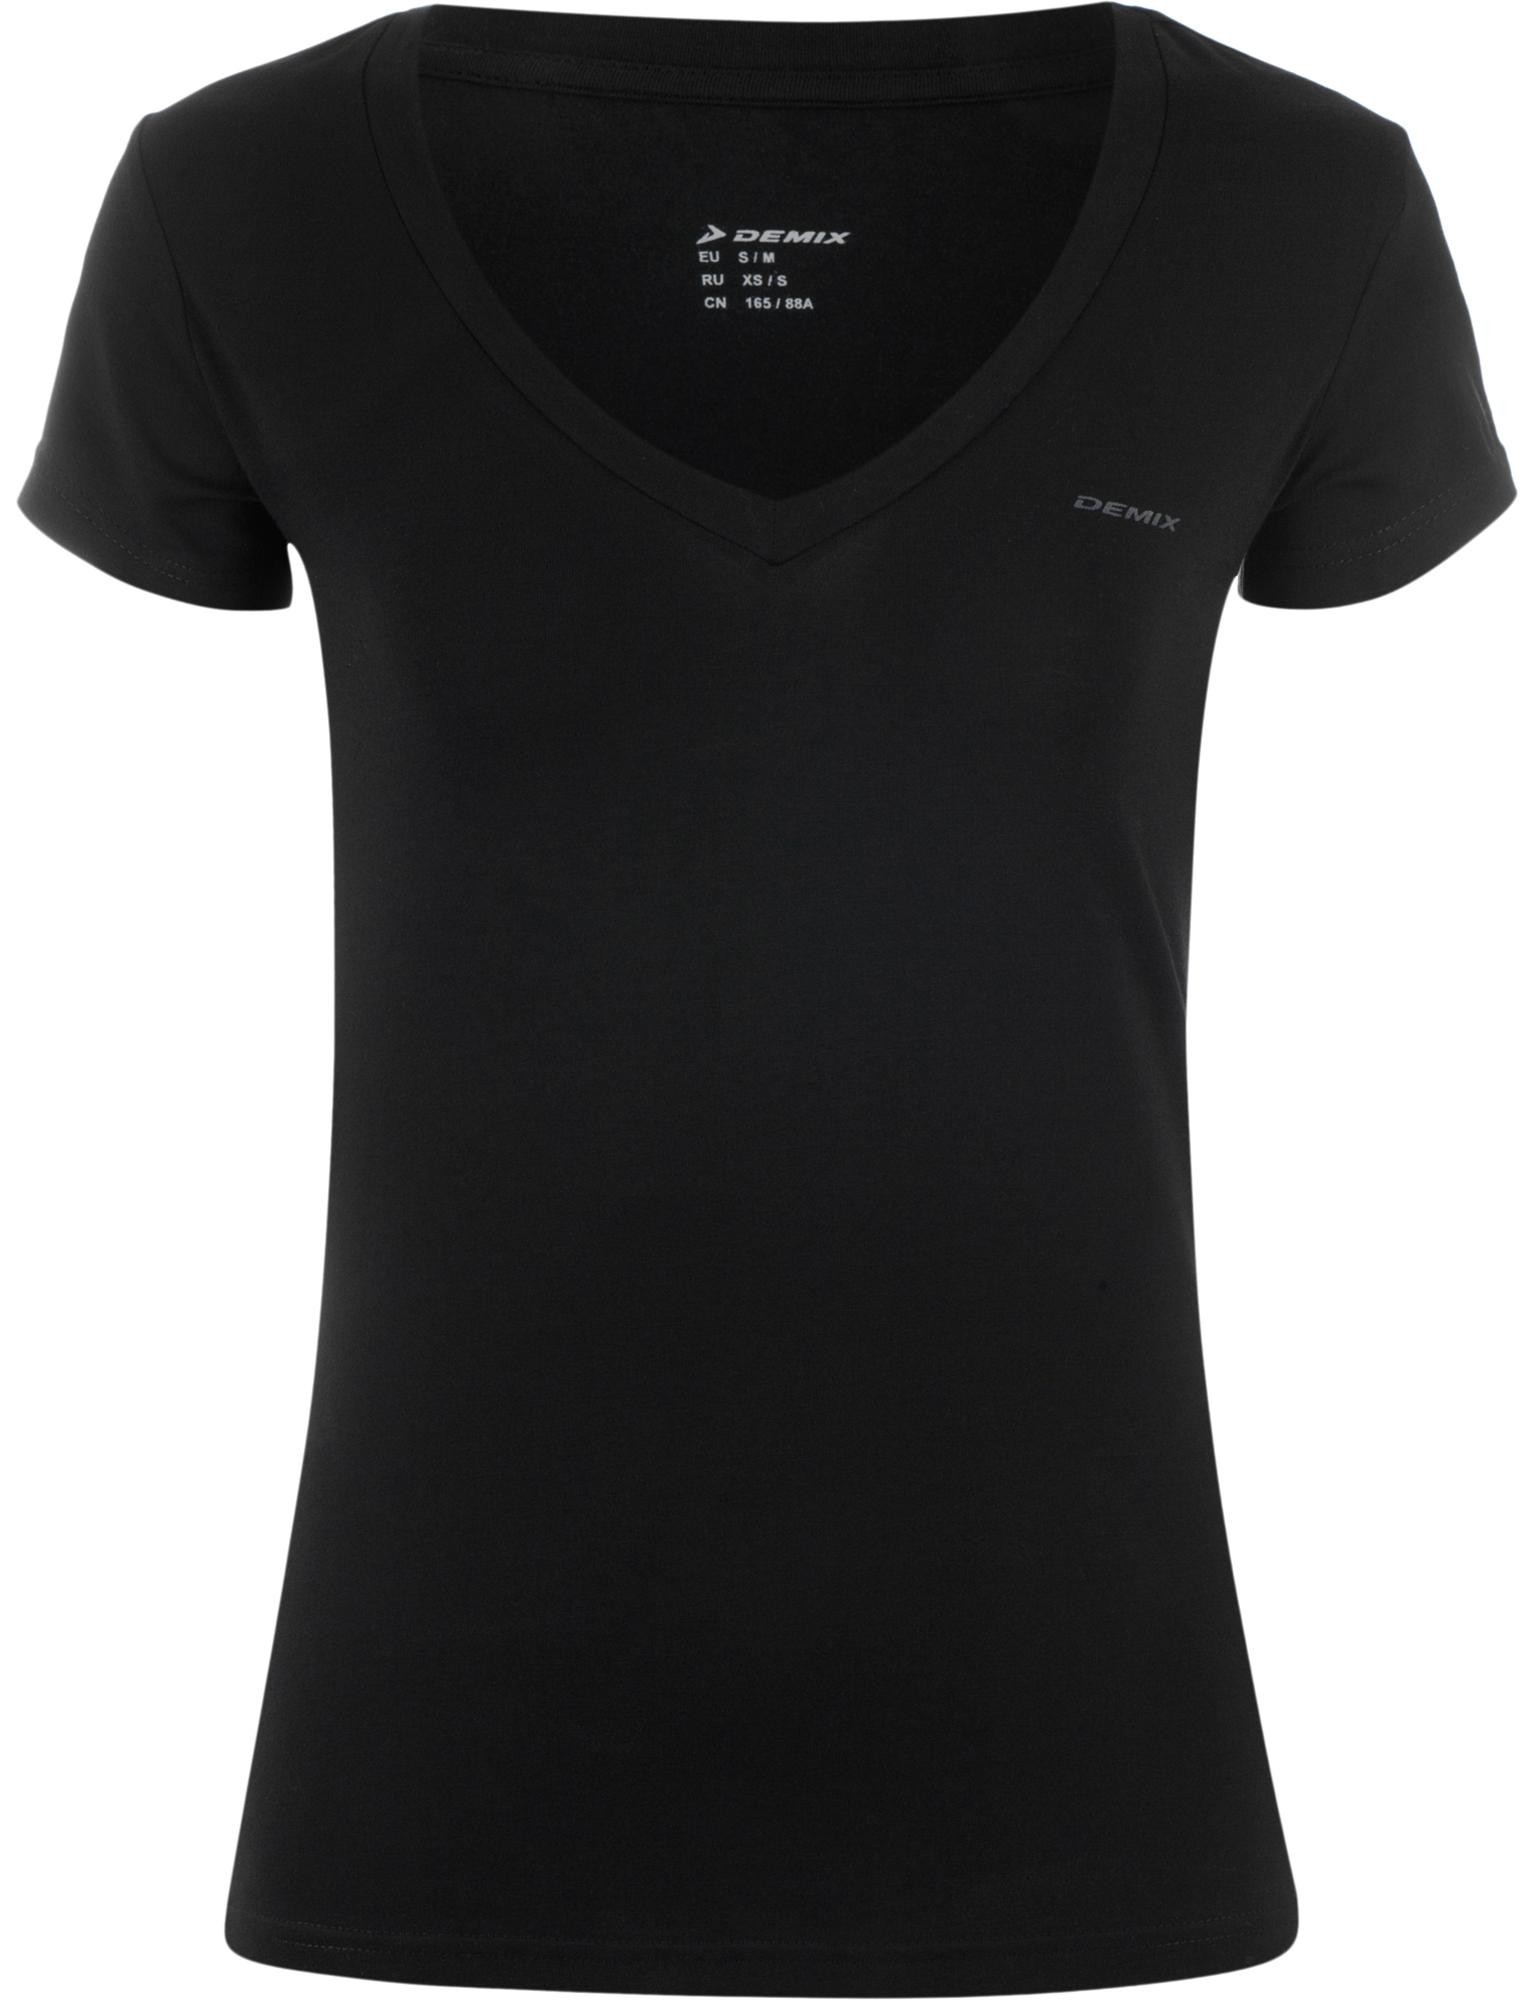 Demix Футболка женская Demix футболка женская